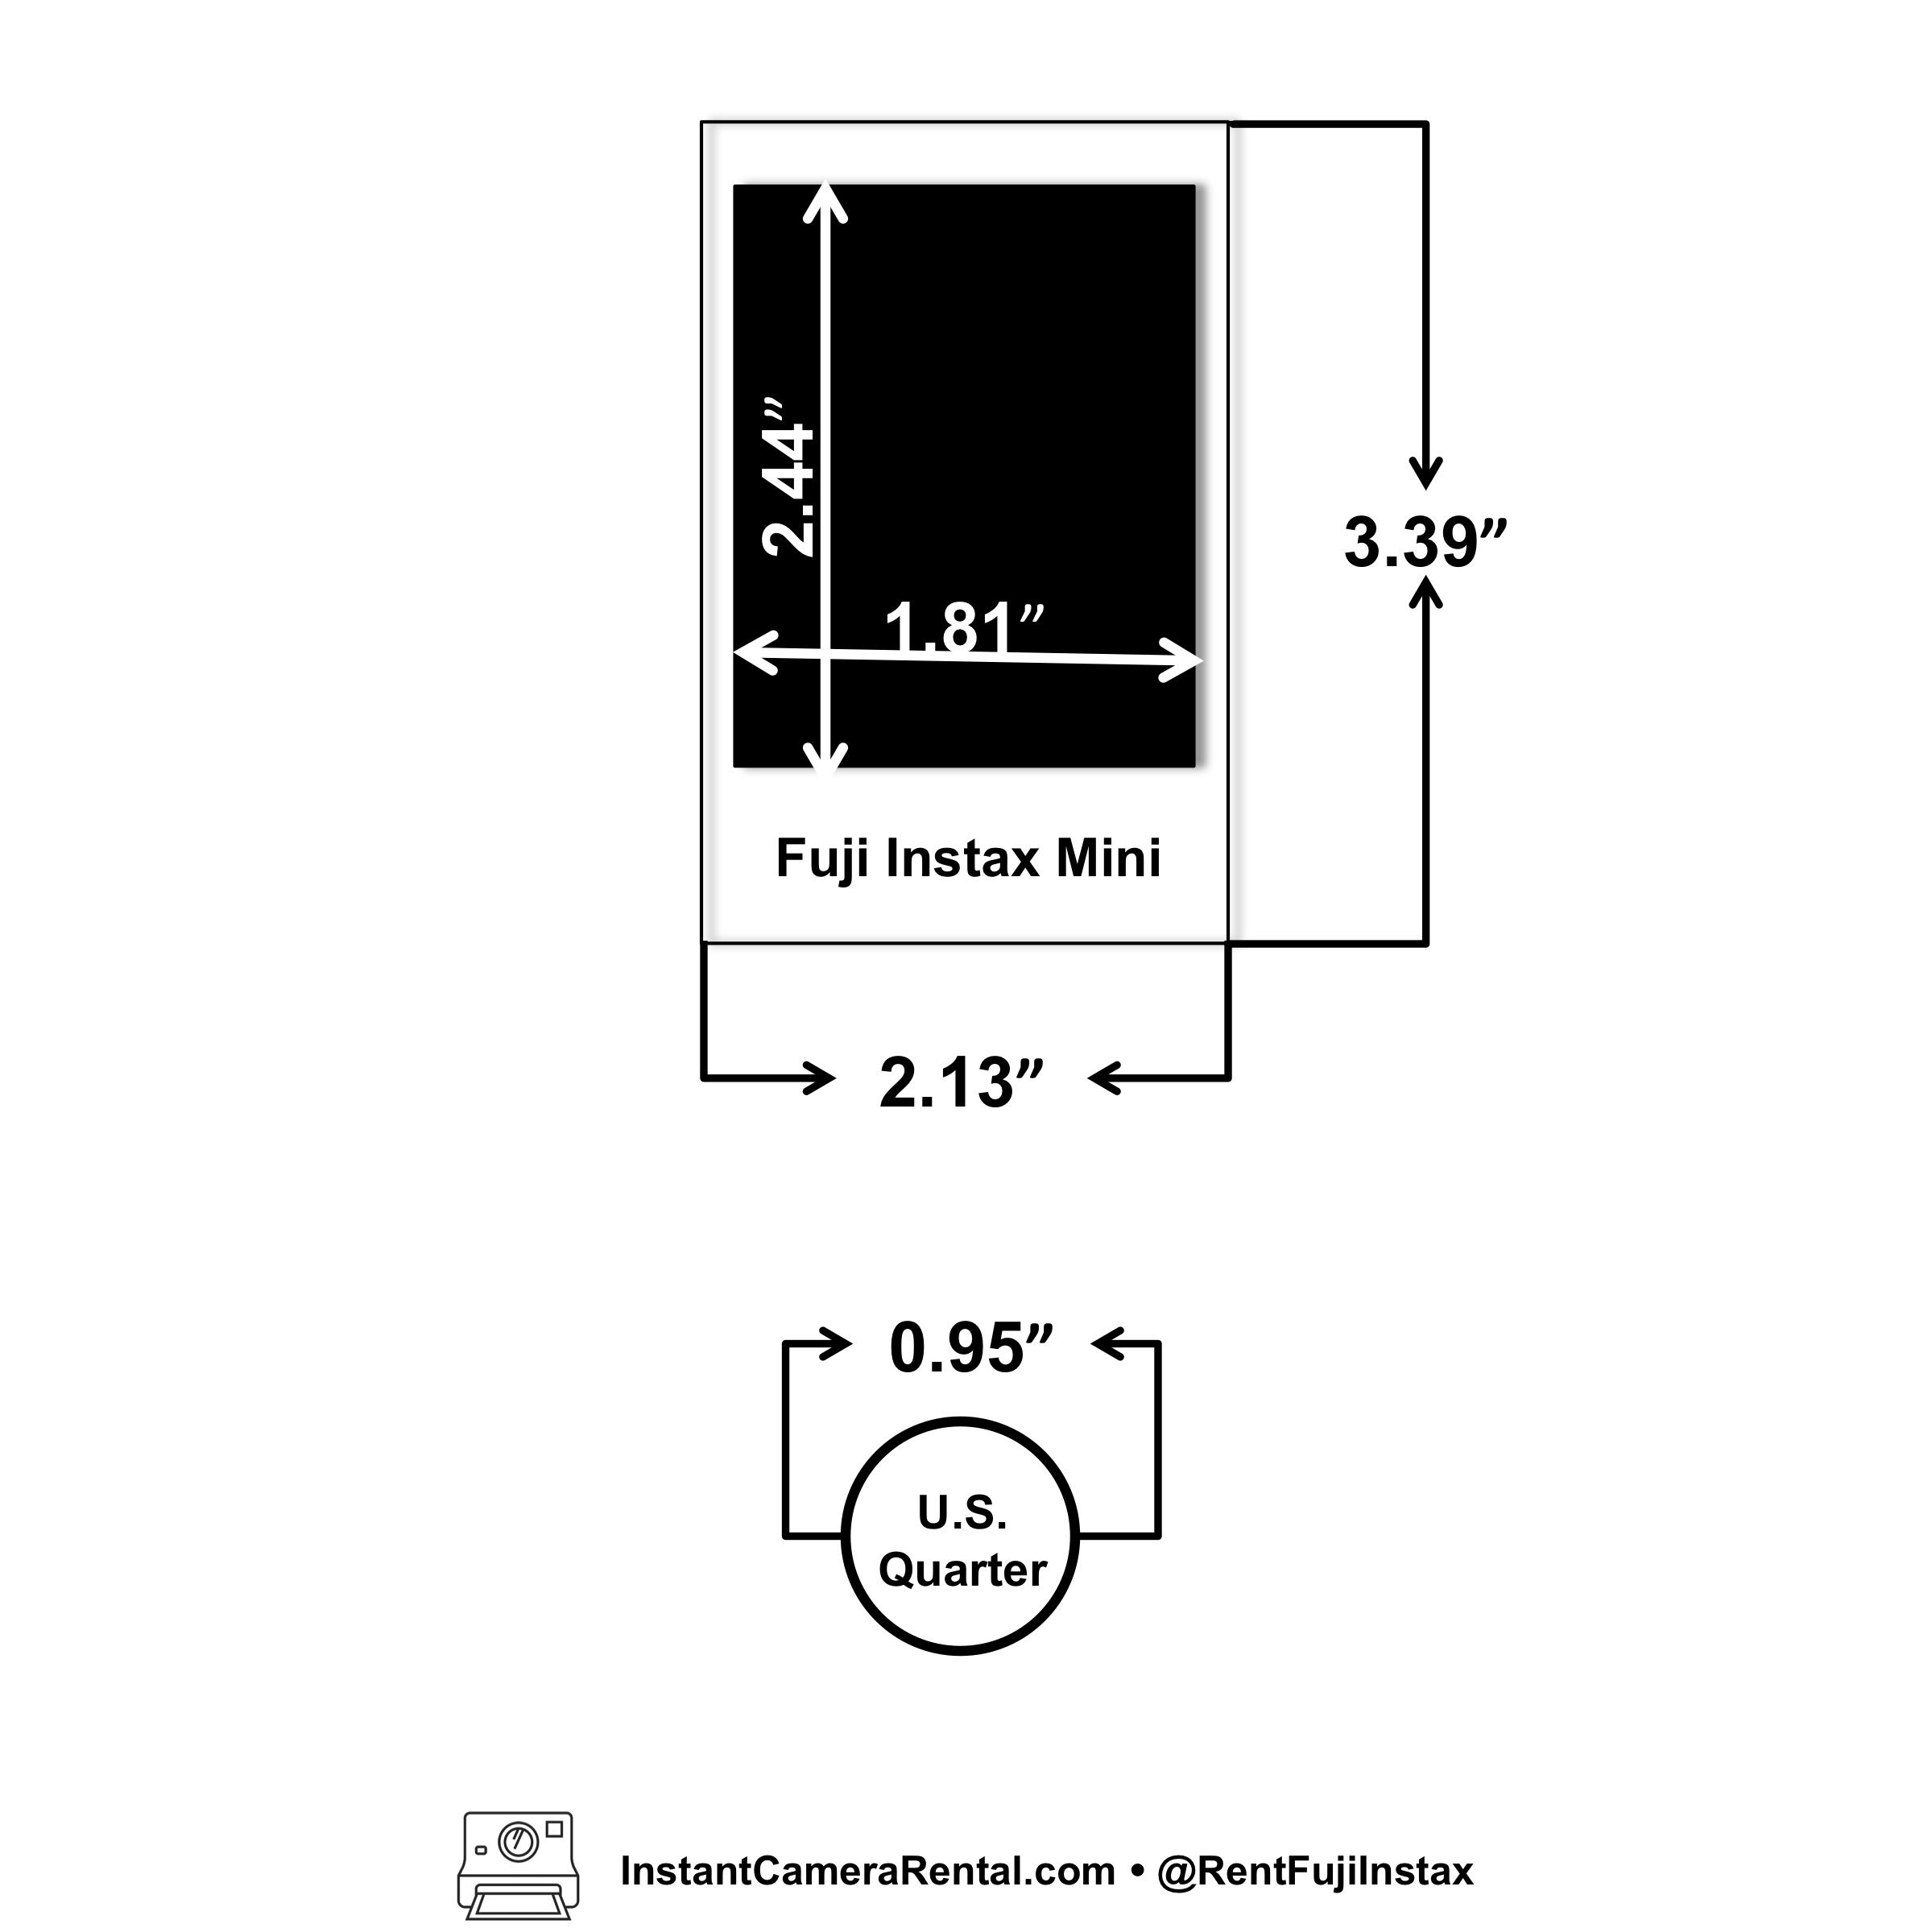 Fuji Instax Mini Photo Size Visit Us At